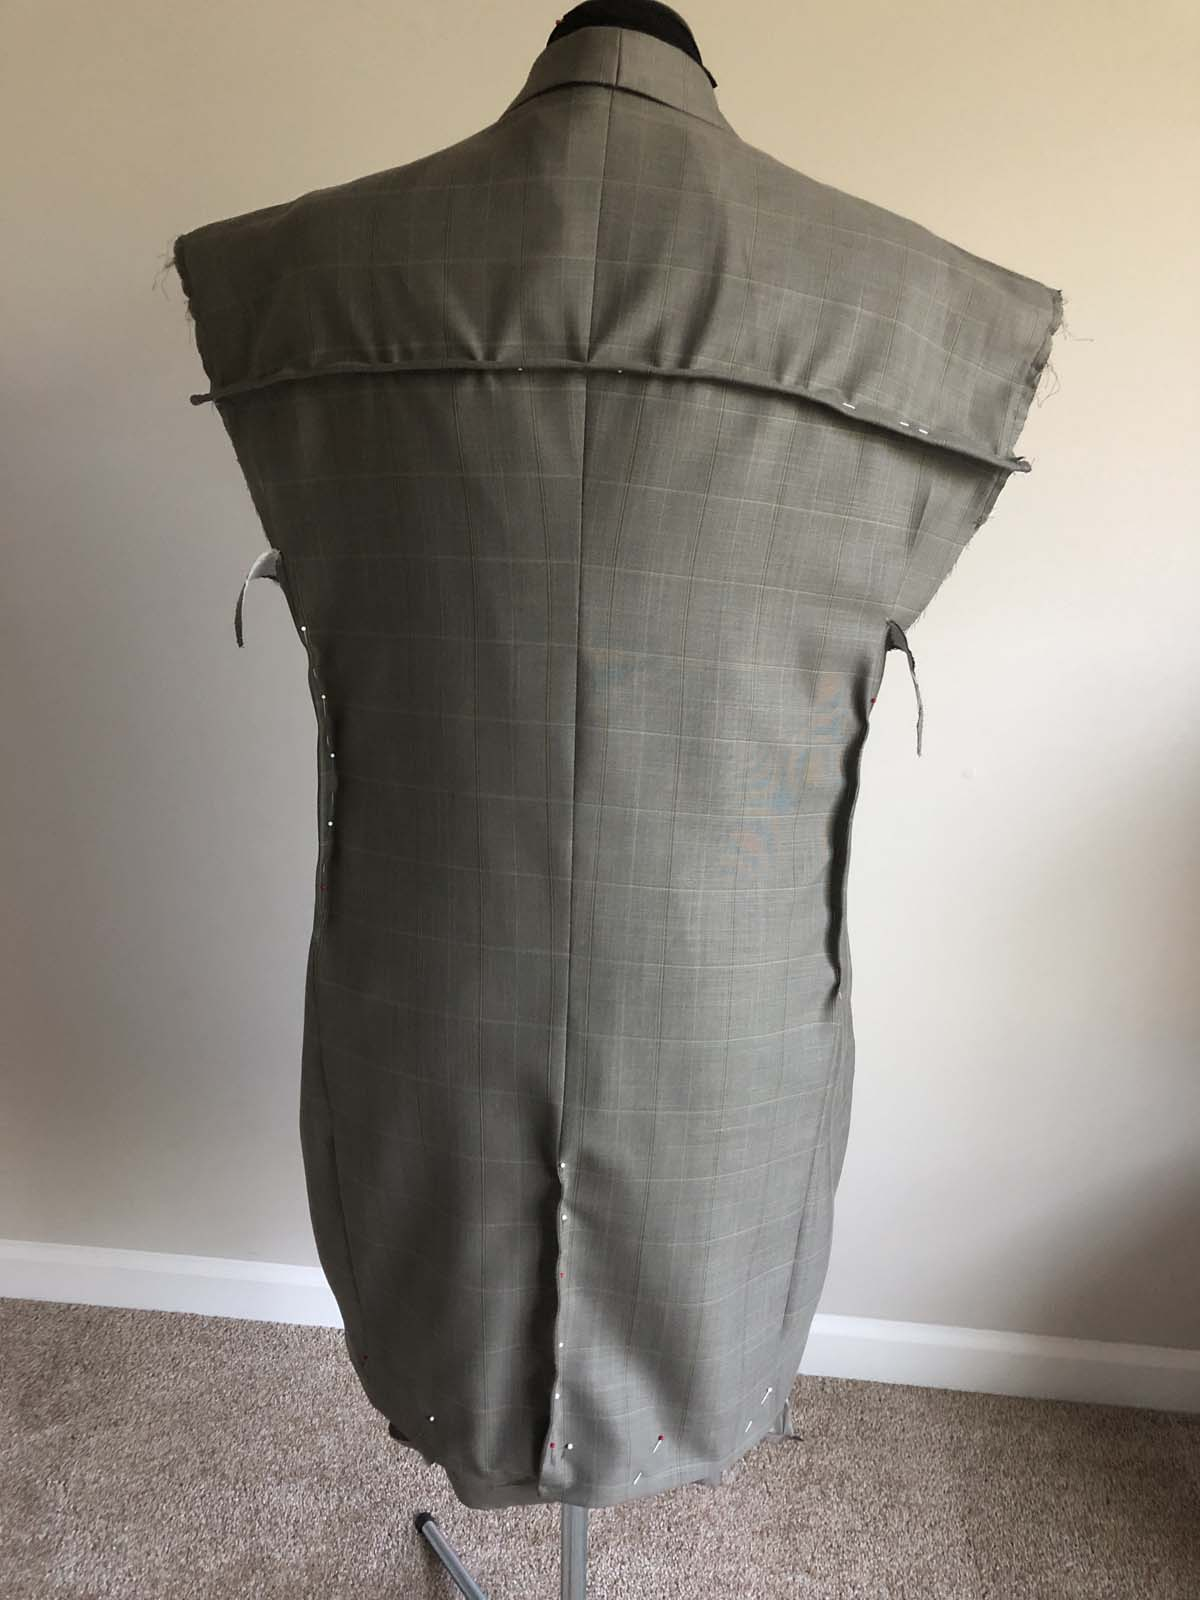 Men's suit jacket back length is adjusted by adding a yoke